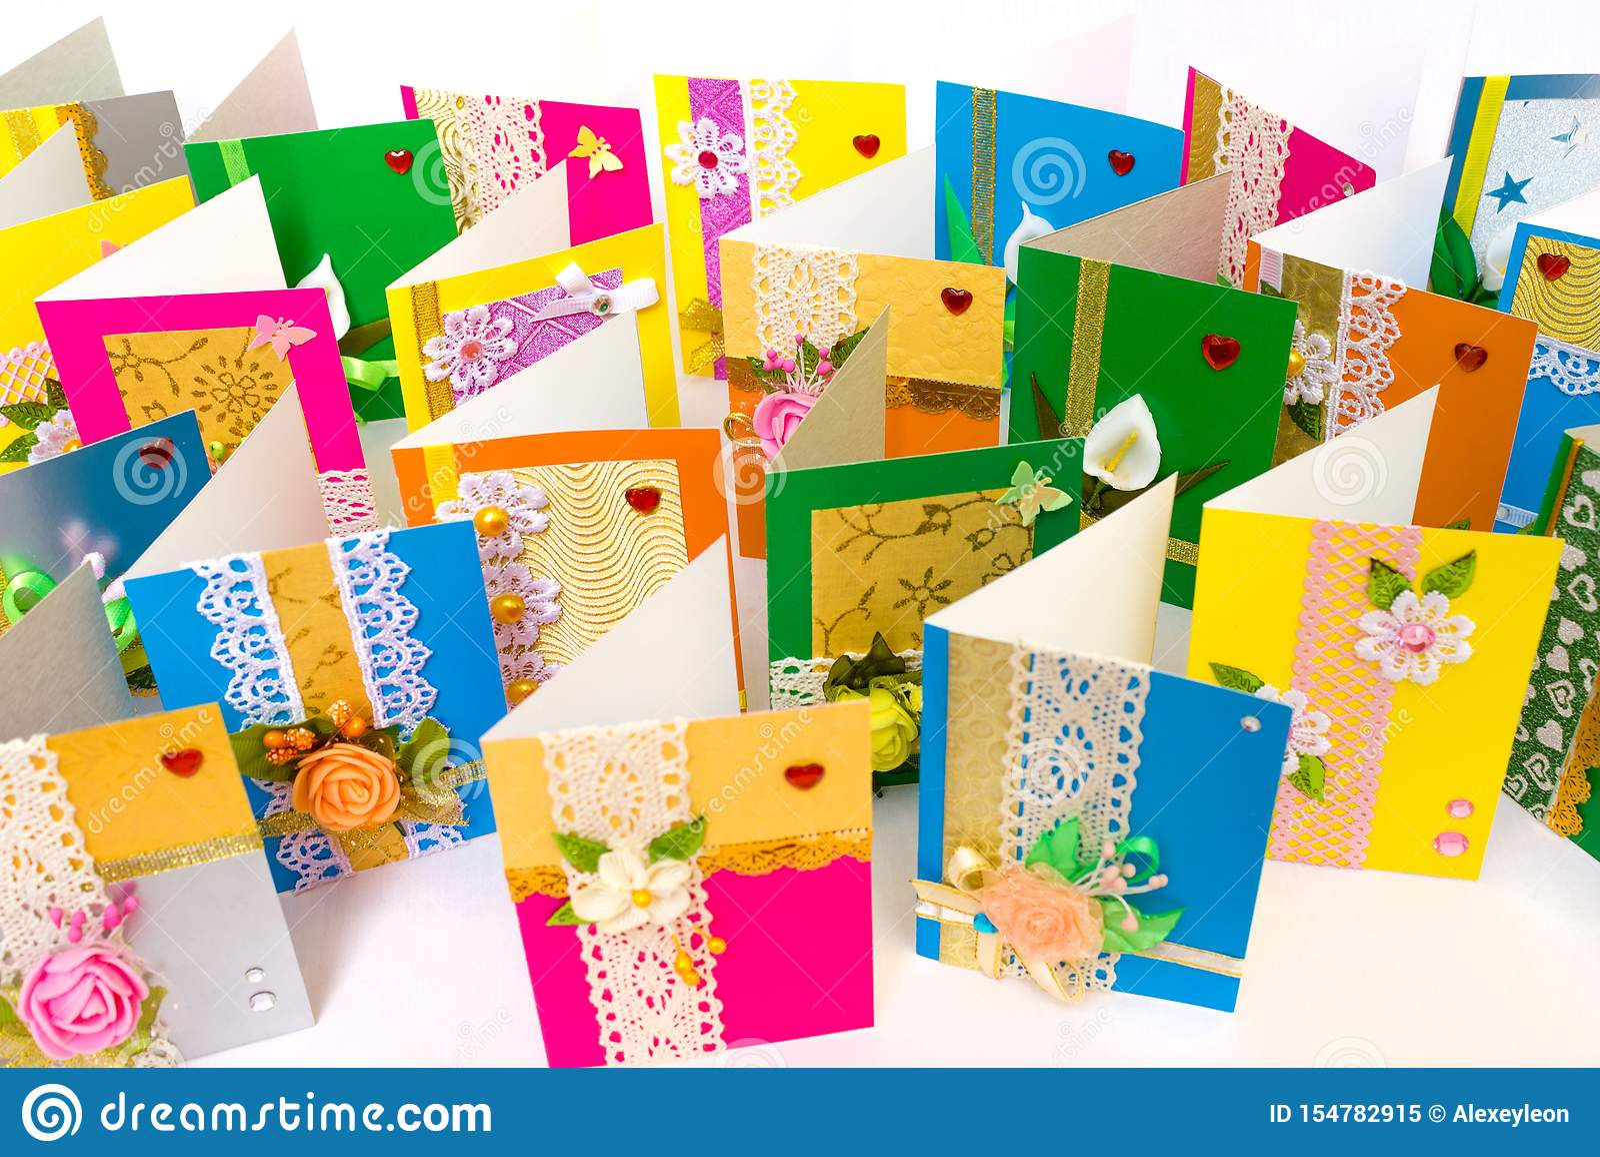 beautiful varied handmade greeting cards stock image